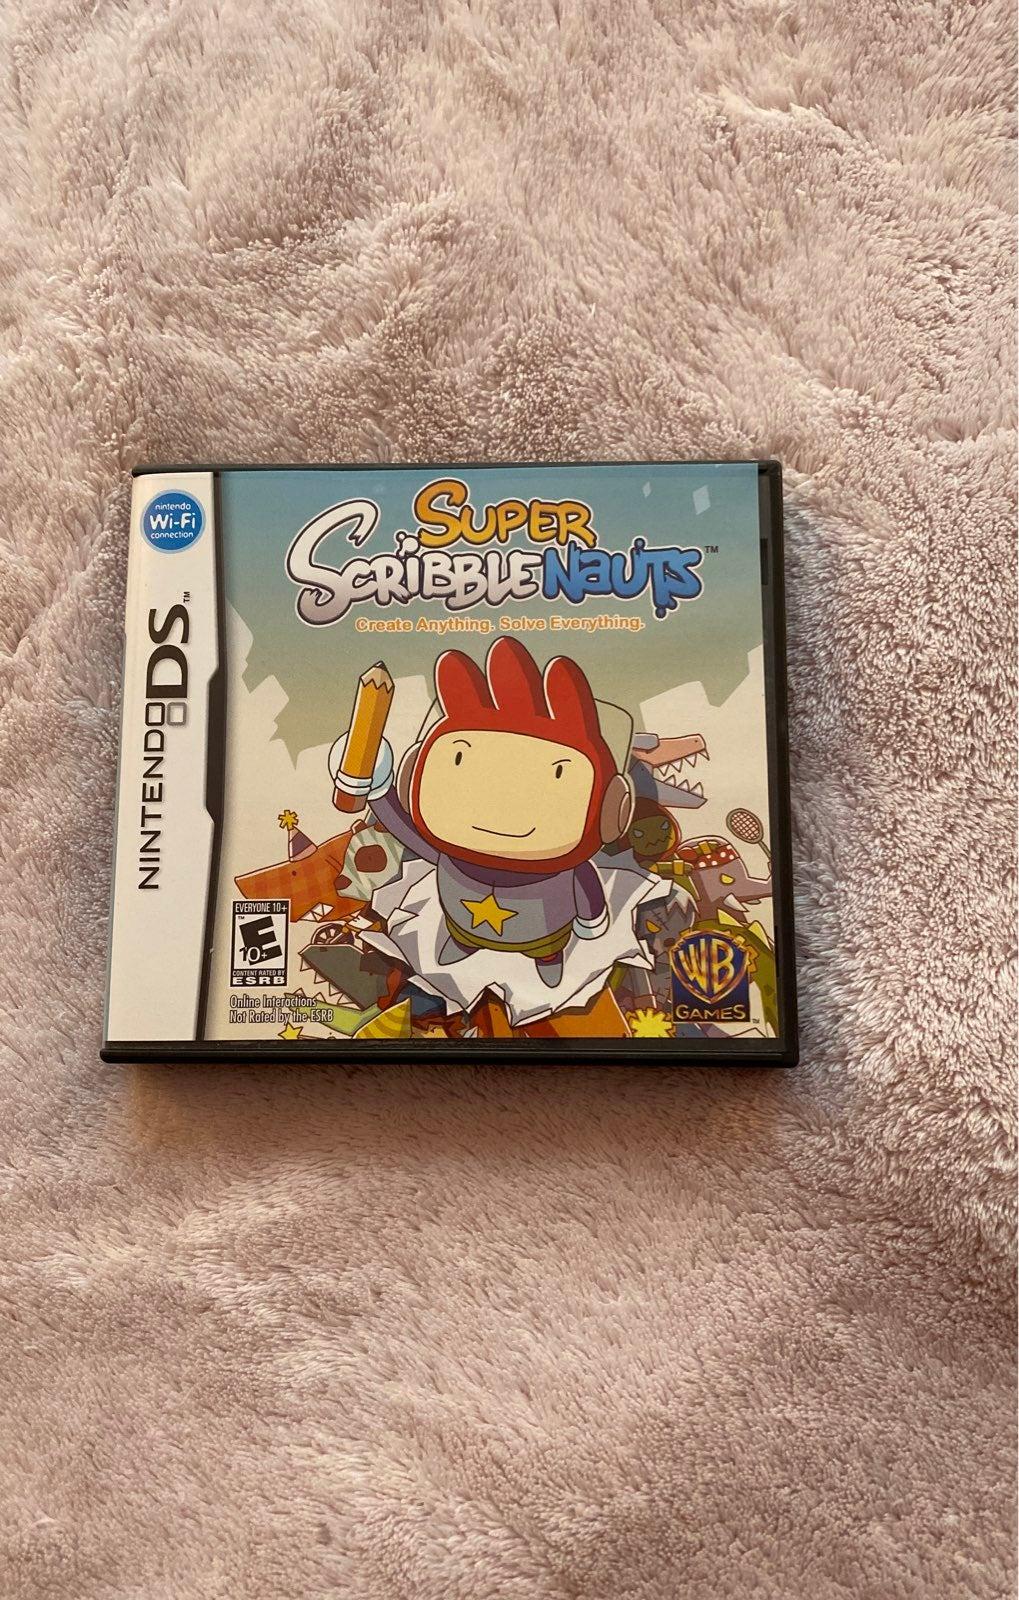 Super Scribblenauts on Nintendo DS